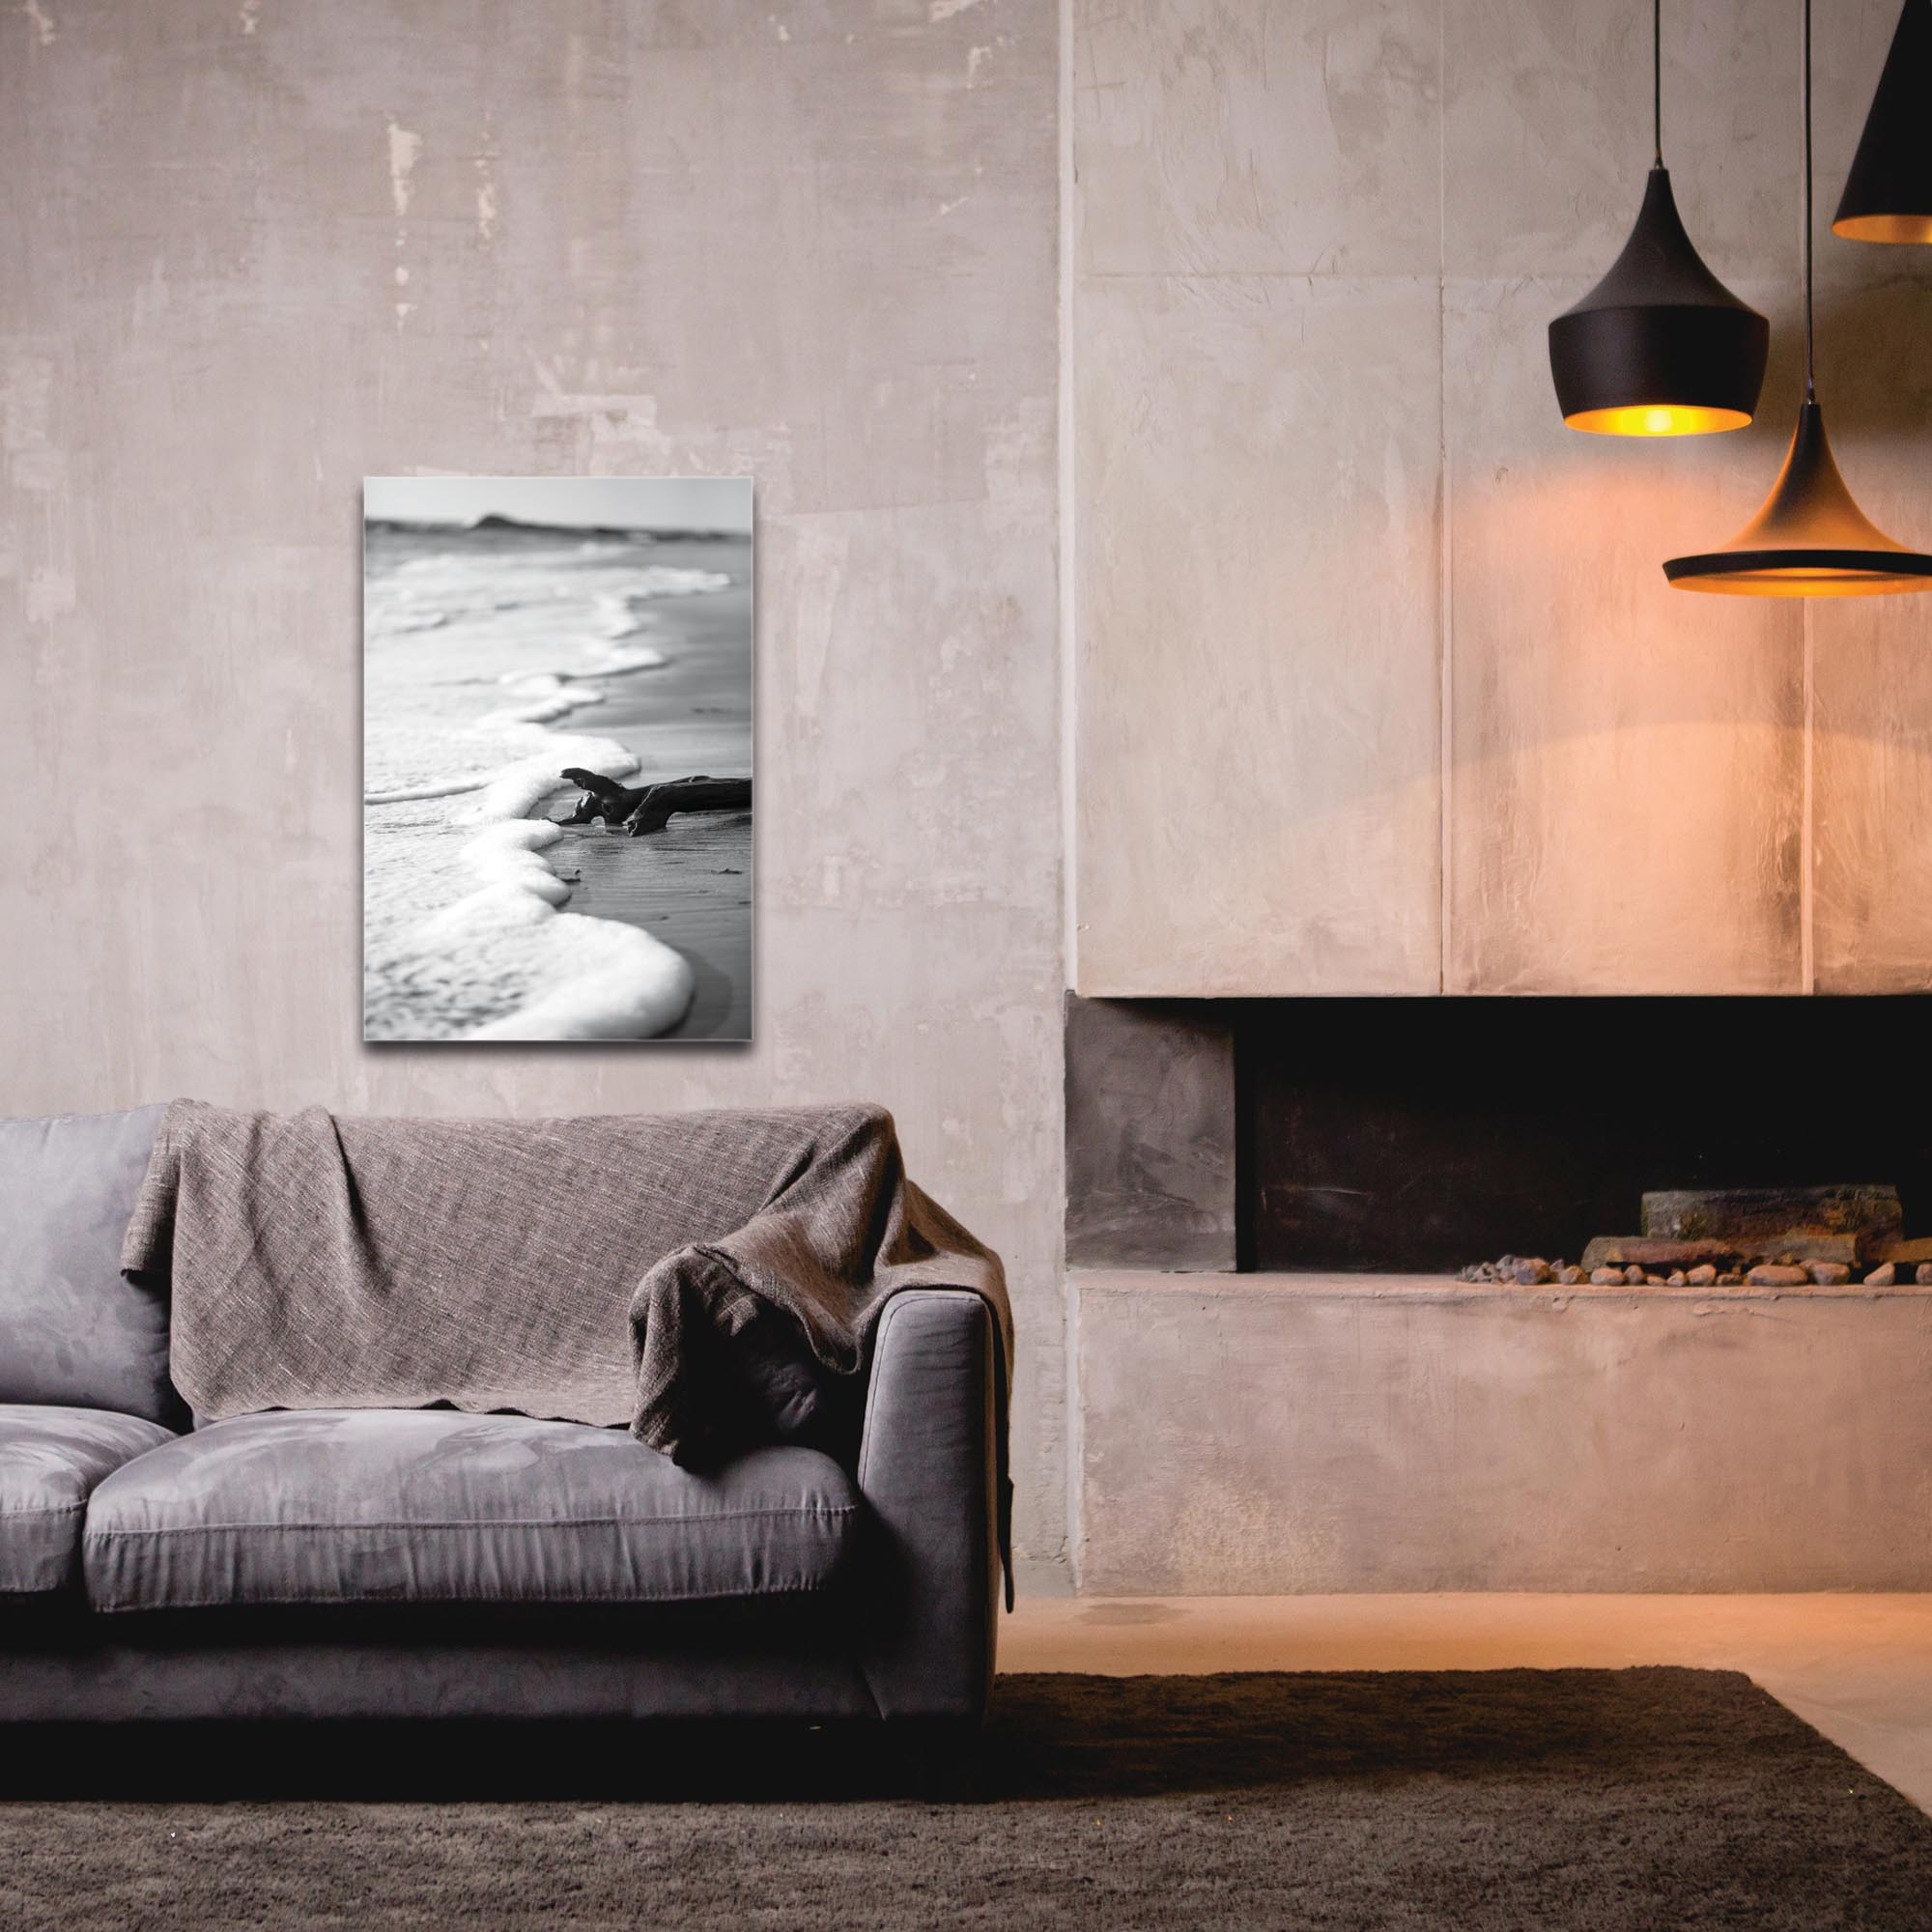 Film Noir Wall Art 'Foaming Sea' - Coastal Decor on Metal or Plexiglass - Image 3